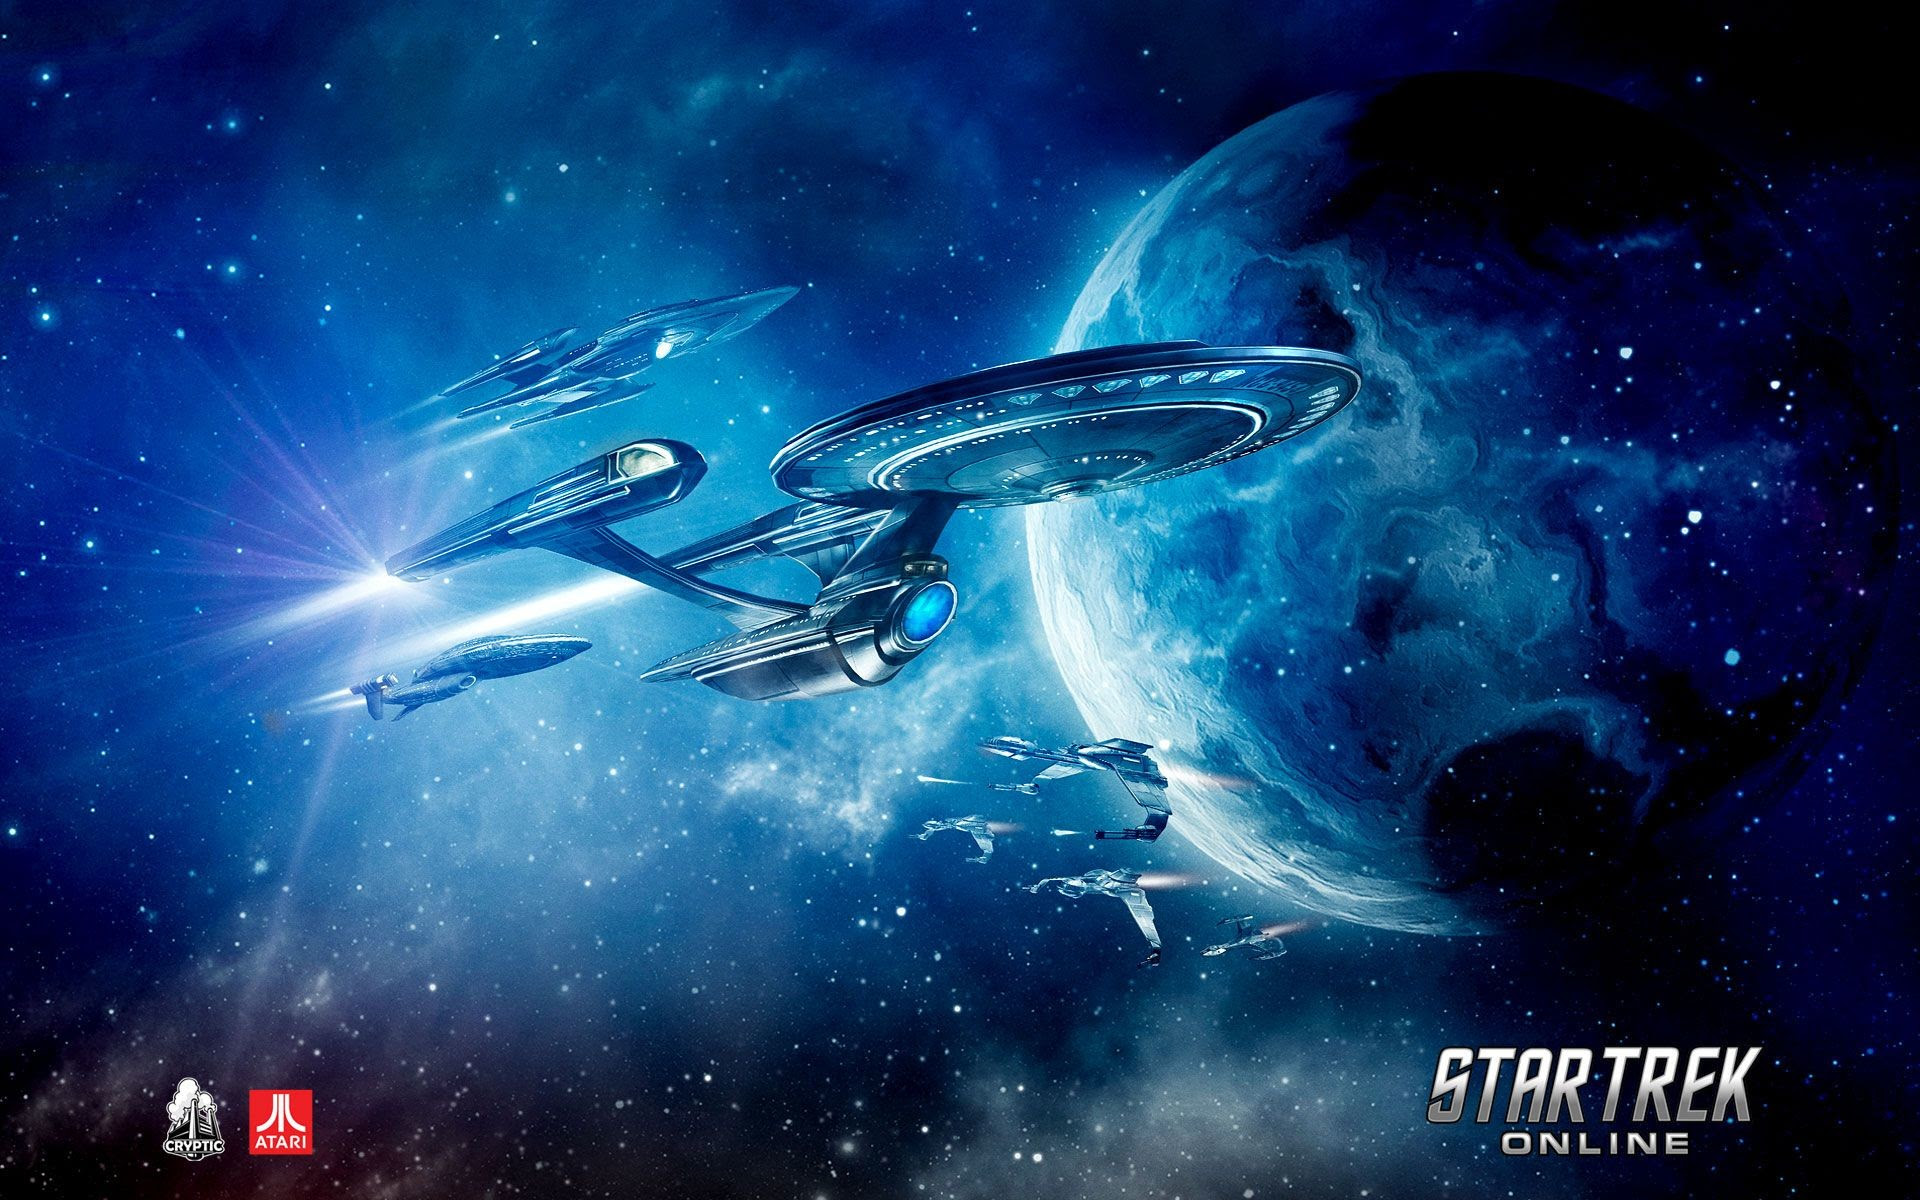 Star Trek Wallpaper High Resolution 66 Images